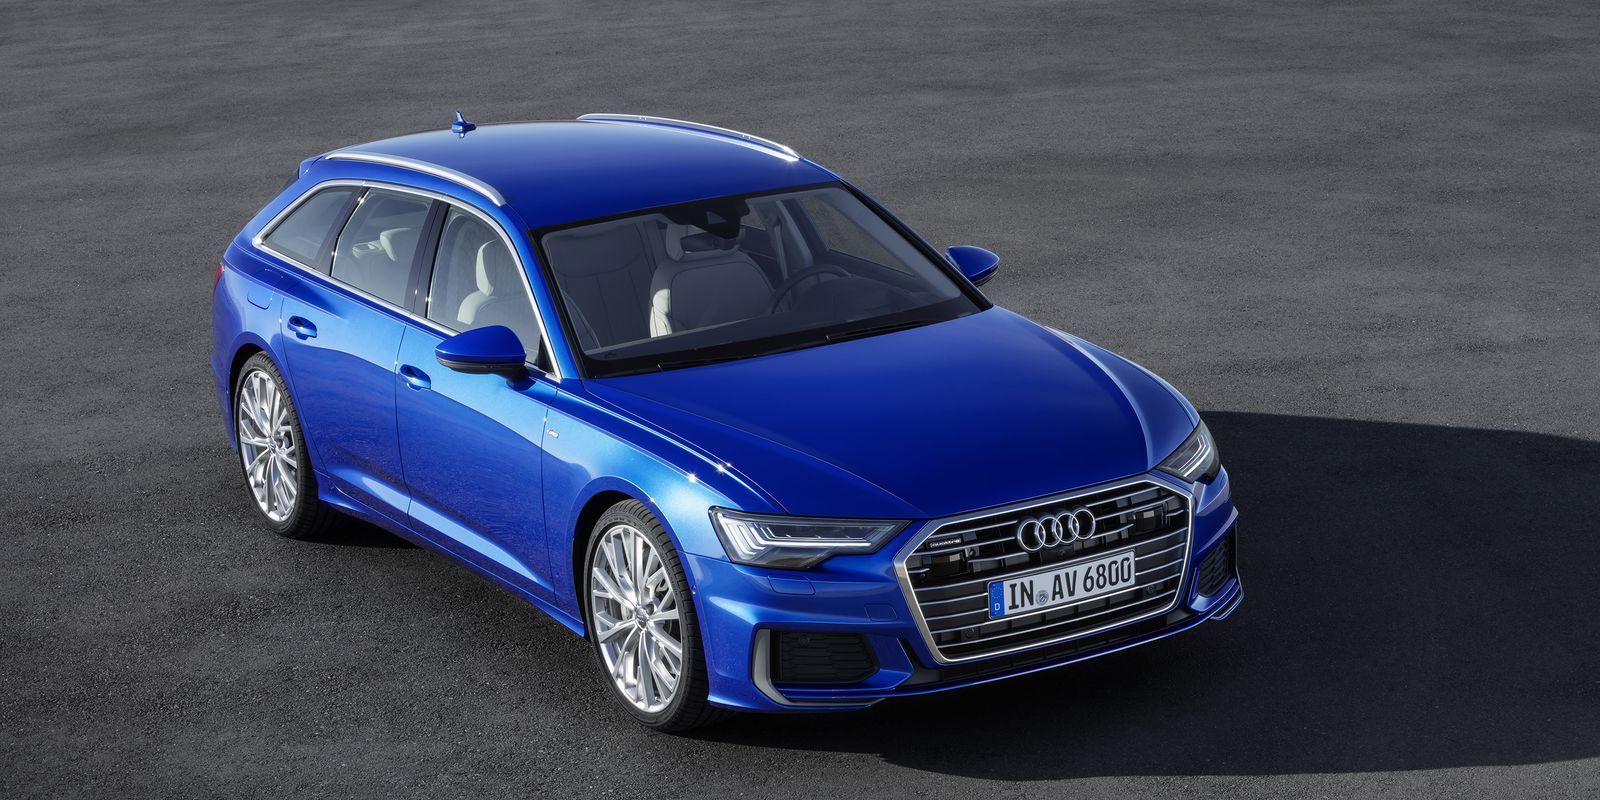 2019 Audi A6 Avant Is Beautiful Even If It Won T Come To The Us Audi A6 Avant Audi A6 A6 Avant